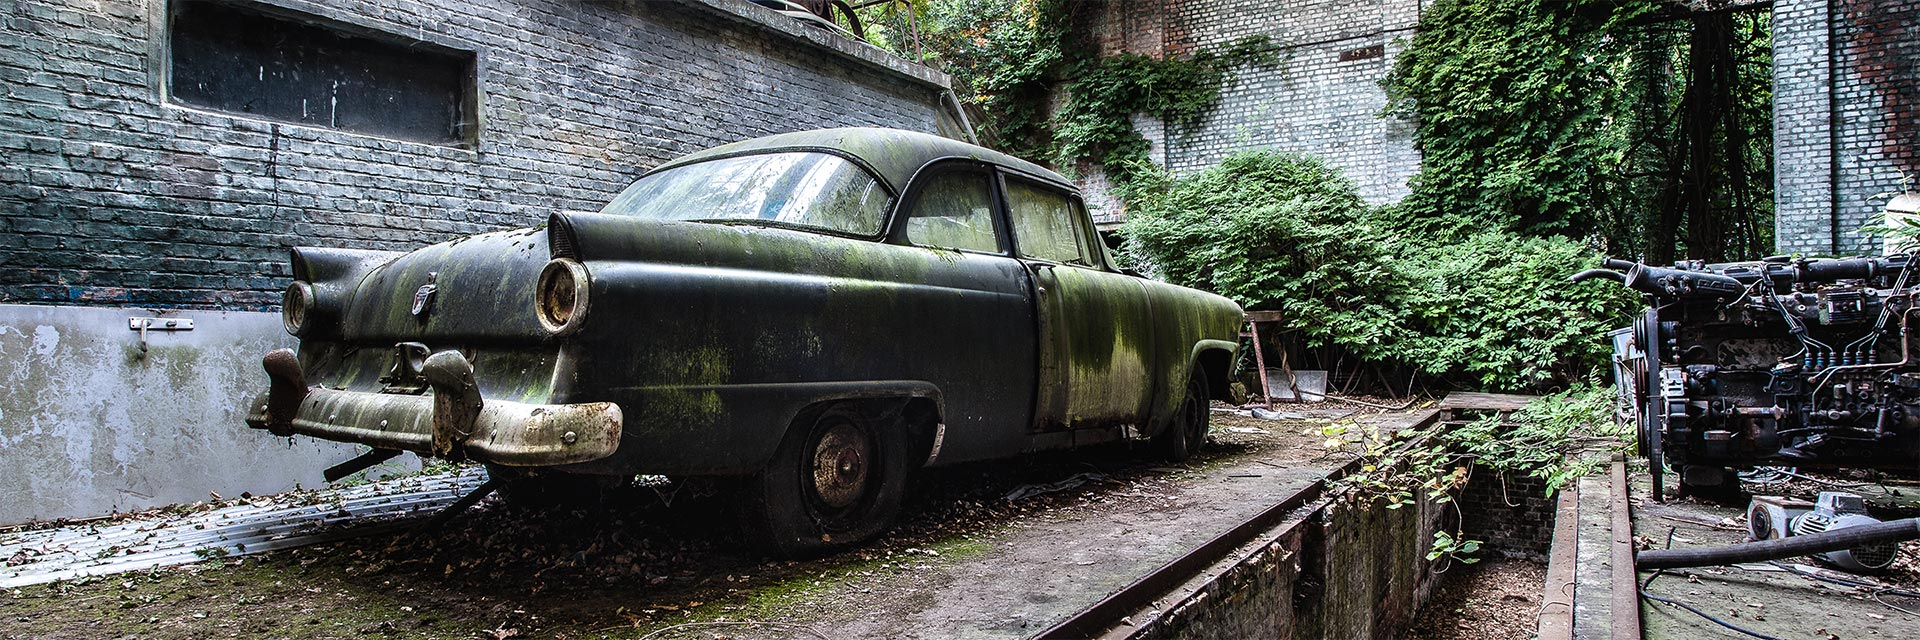 ord-fairlane-vervallen-garage-oude-ford